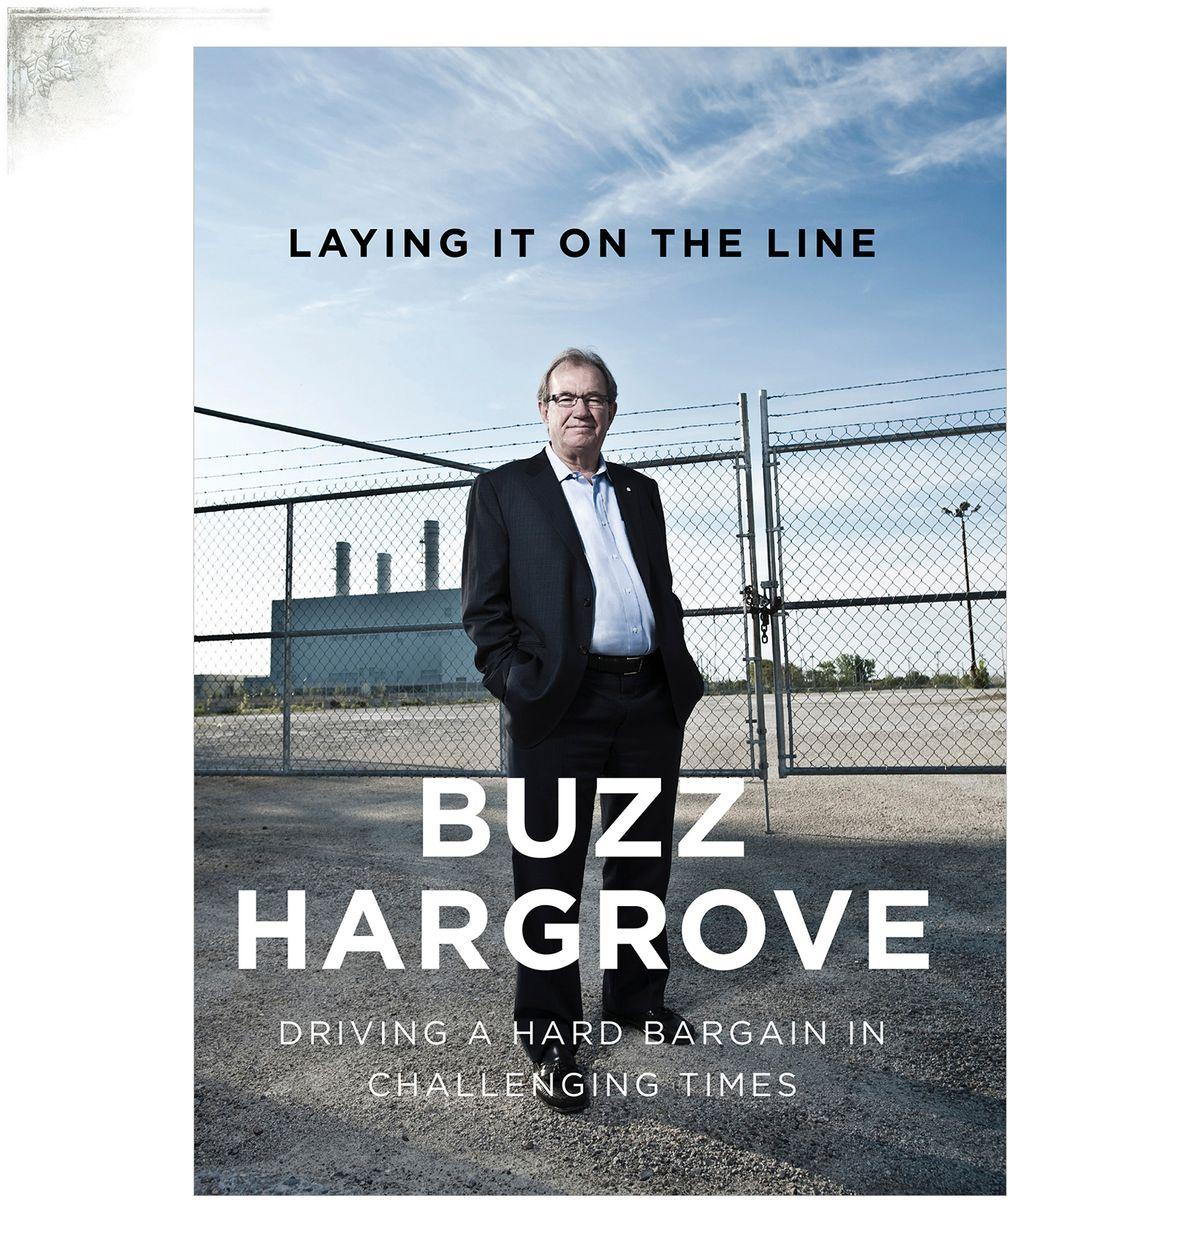 BuzzHargrovePrtPg.jpg